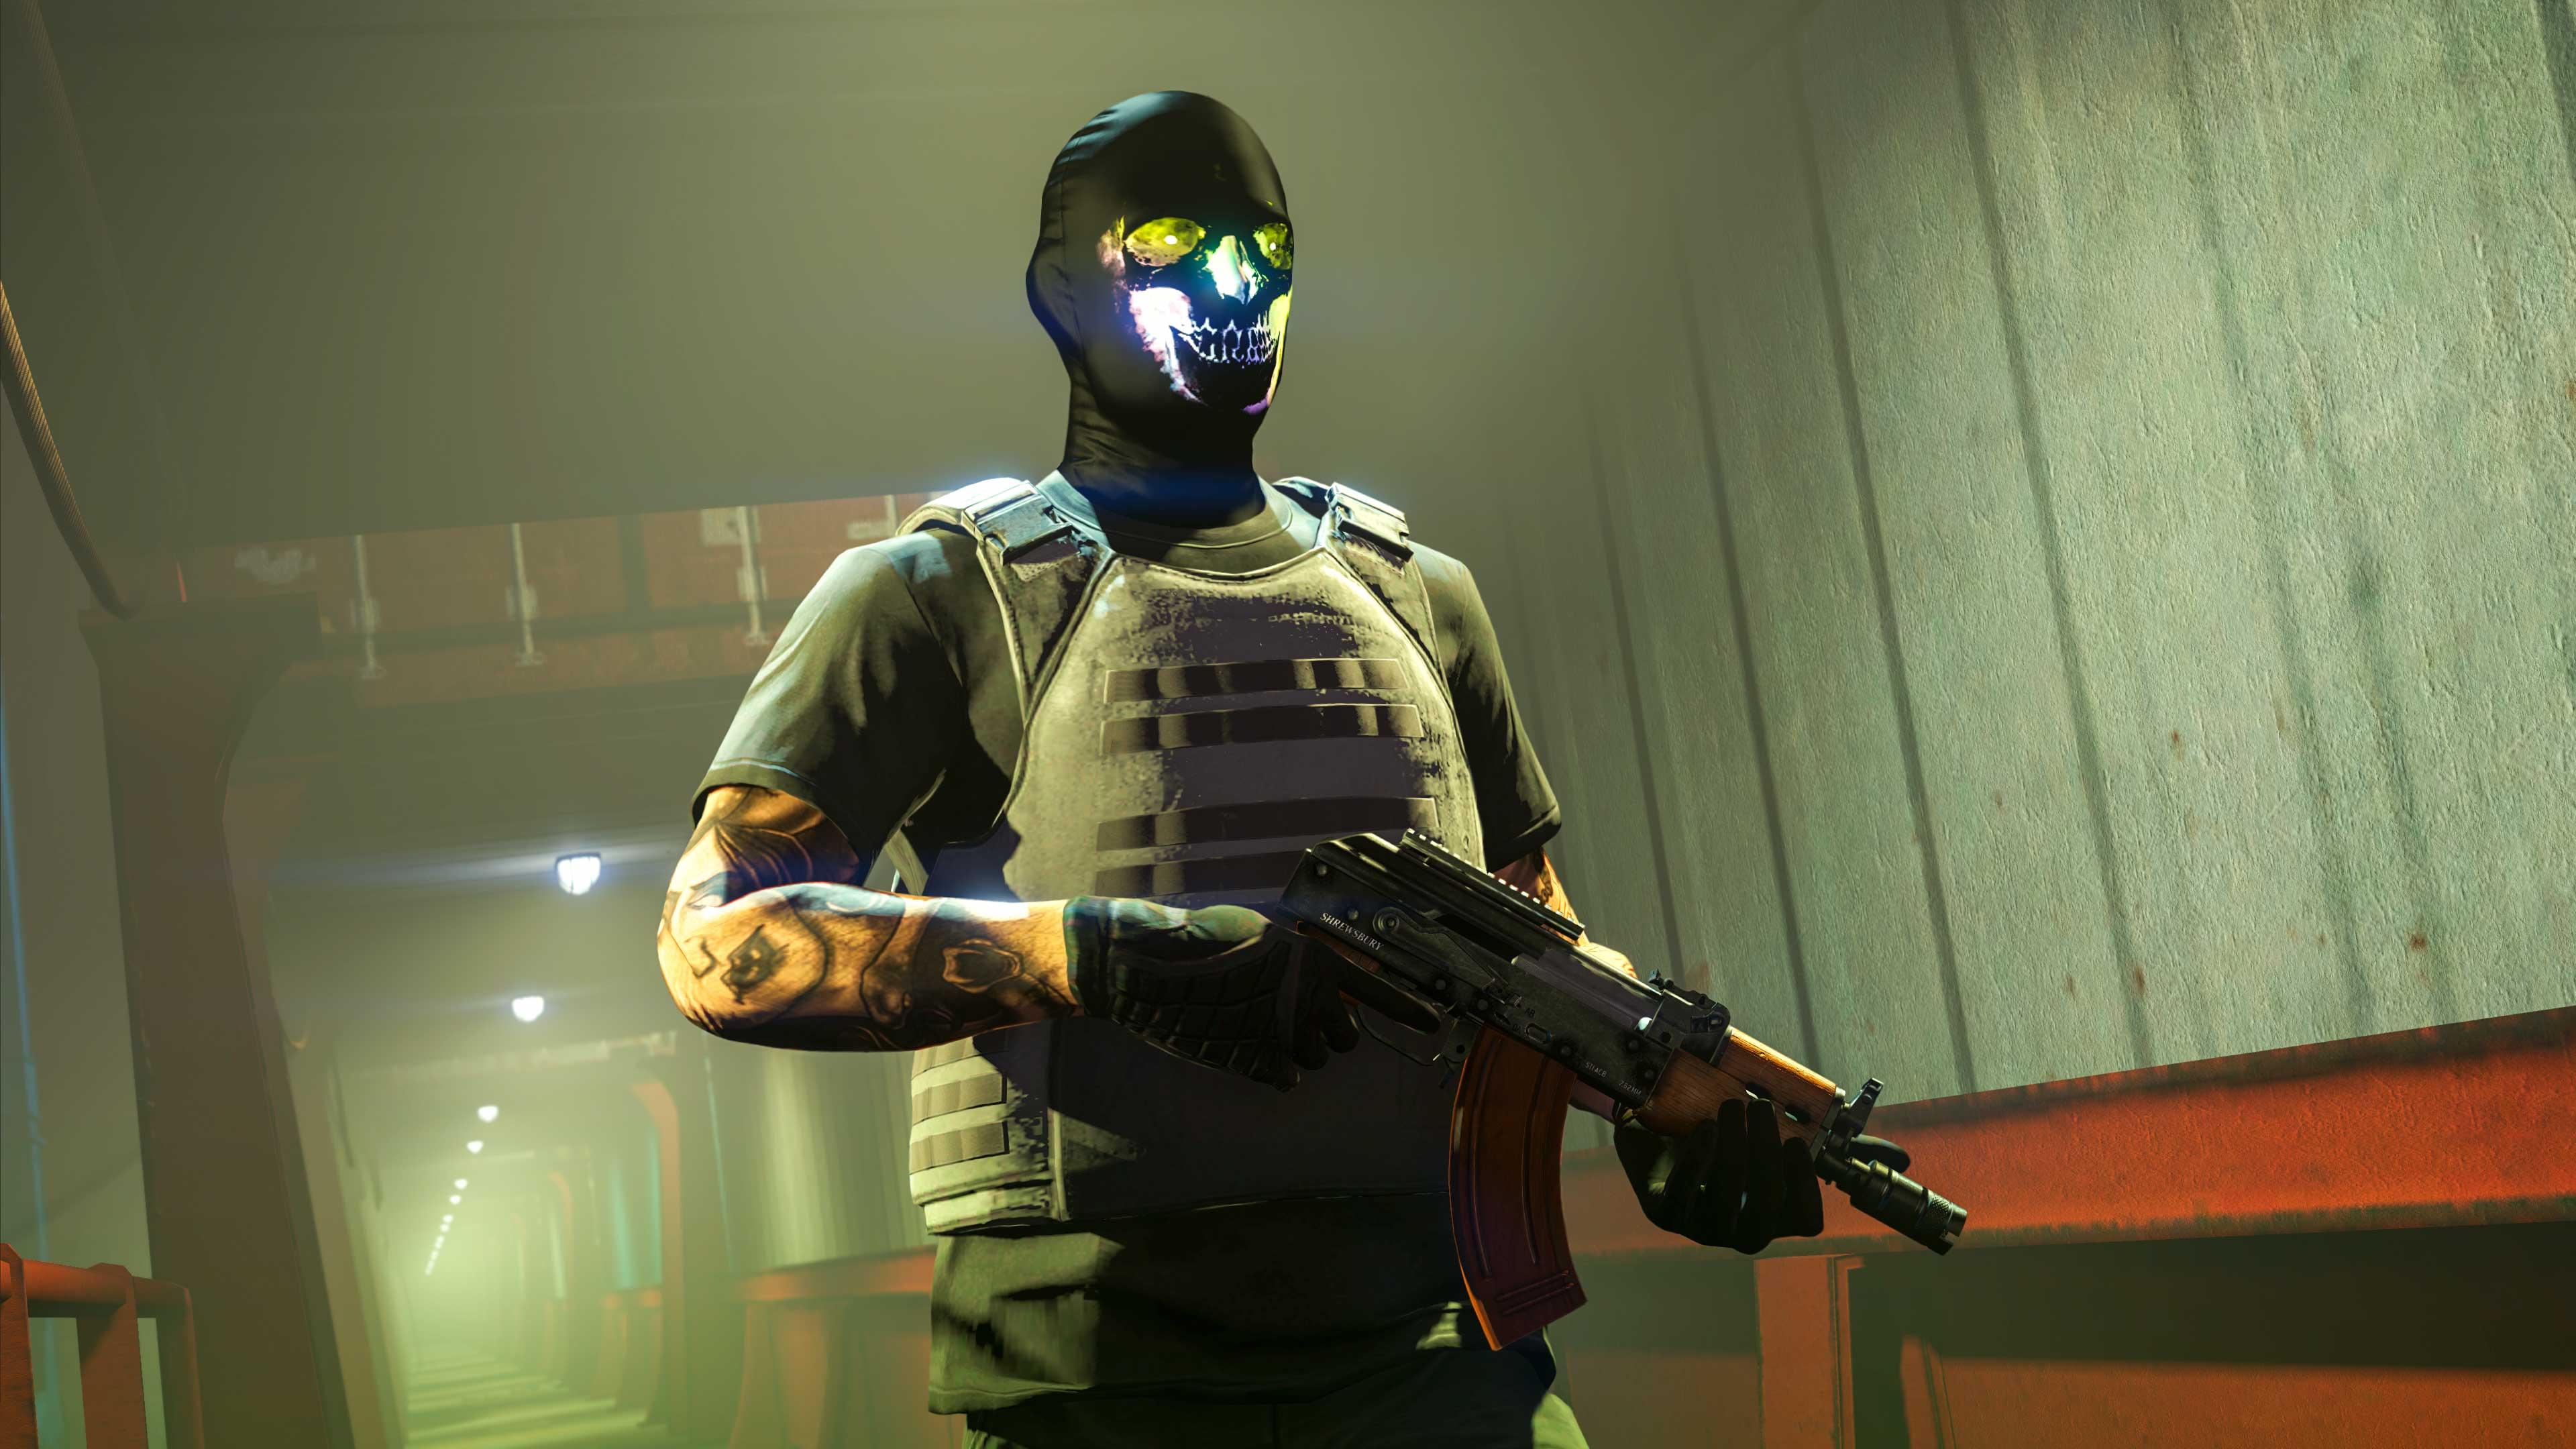 GTA Online Dark X-Ray Emissive Mask